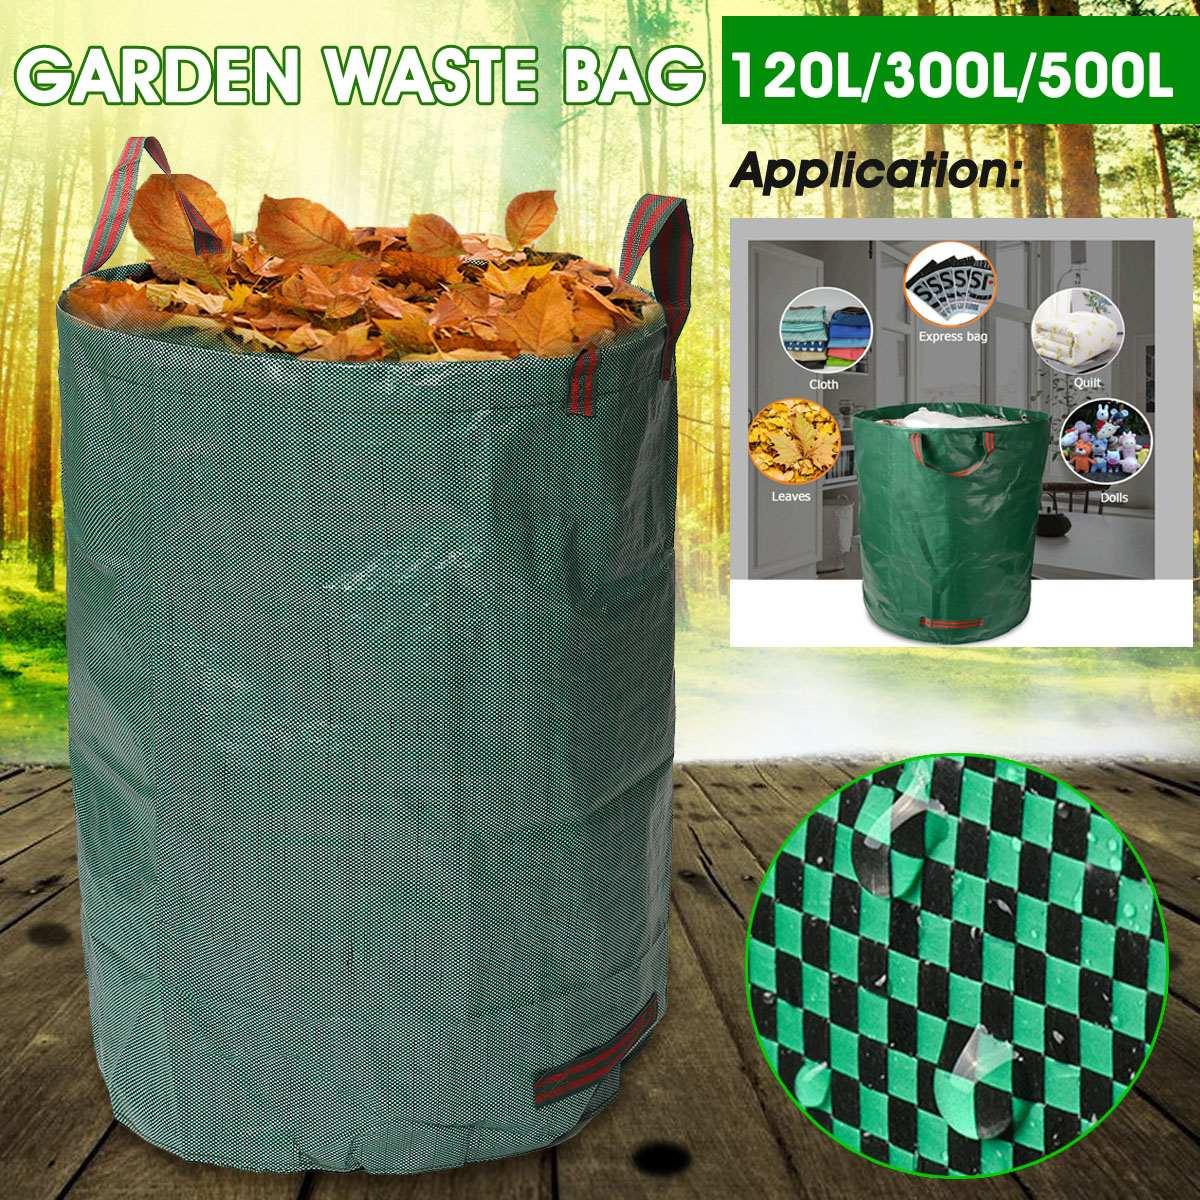 Blue Sack Holder Rubbish Bins Plastic Folding Waste Bin Bin Bag Hoop Bags Holder Bin 60//120L